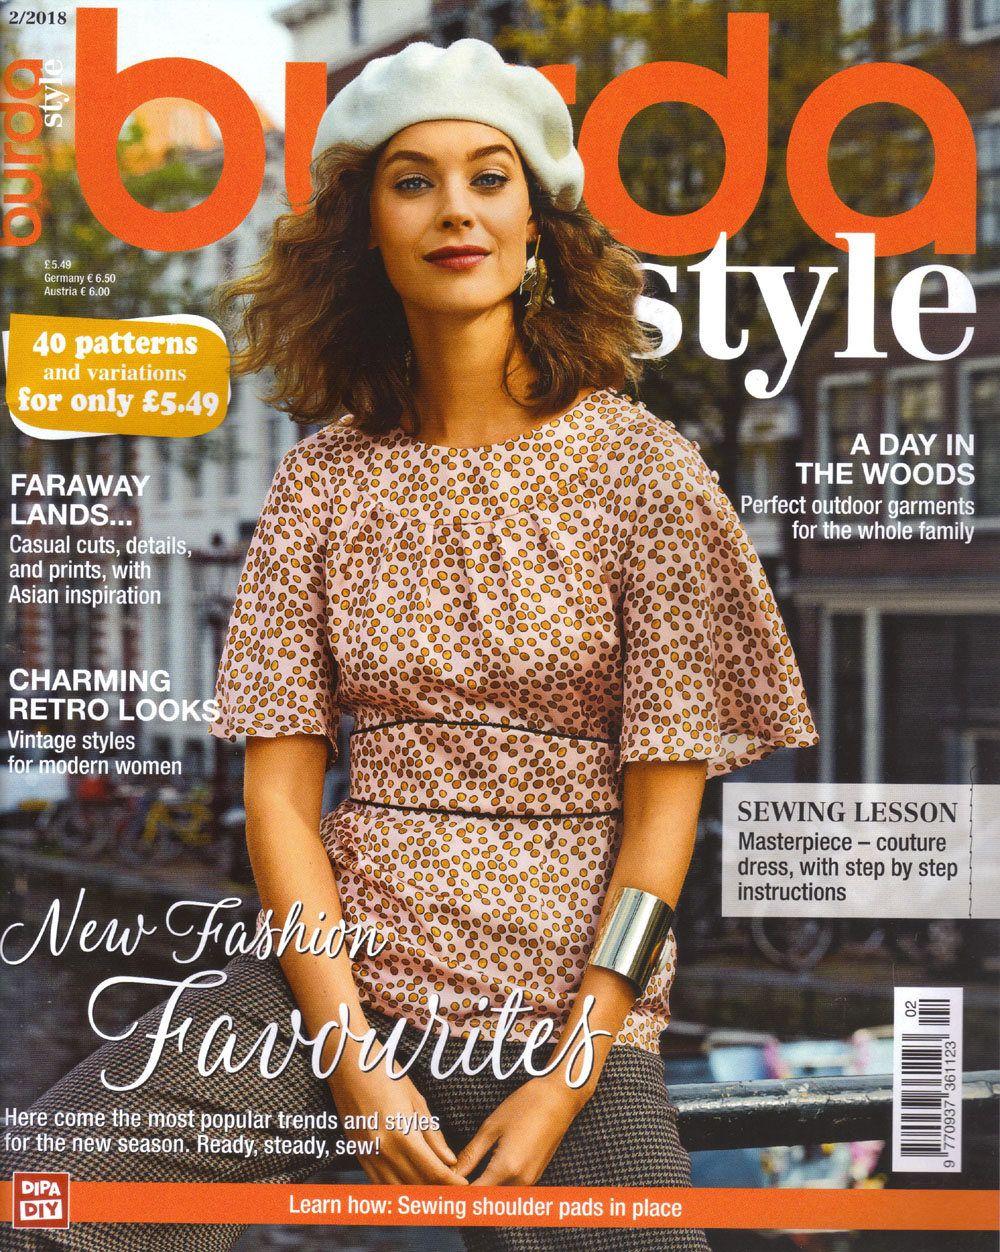 Burda style magazine 12018 english sewing patterns by burda style magazine 12018 english sewing patterns by honeyjamsuniques on etsy jeuxipadfo Image collections